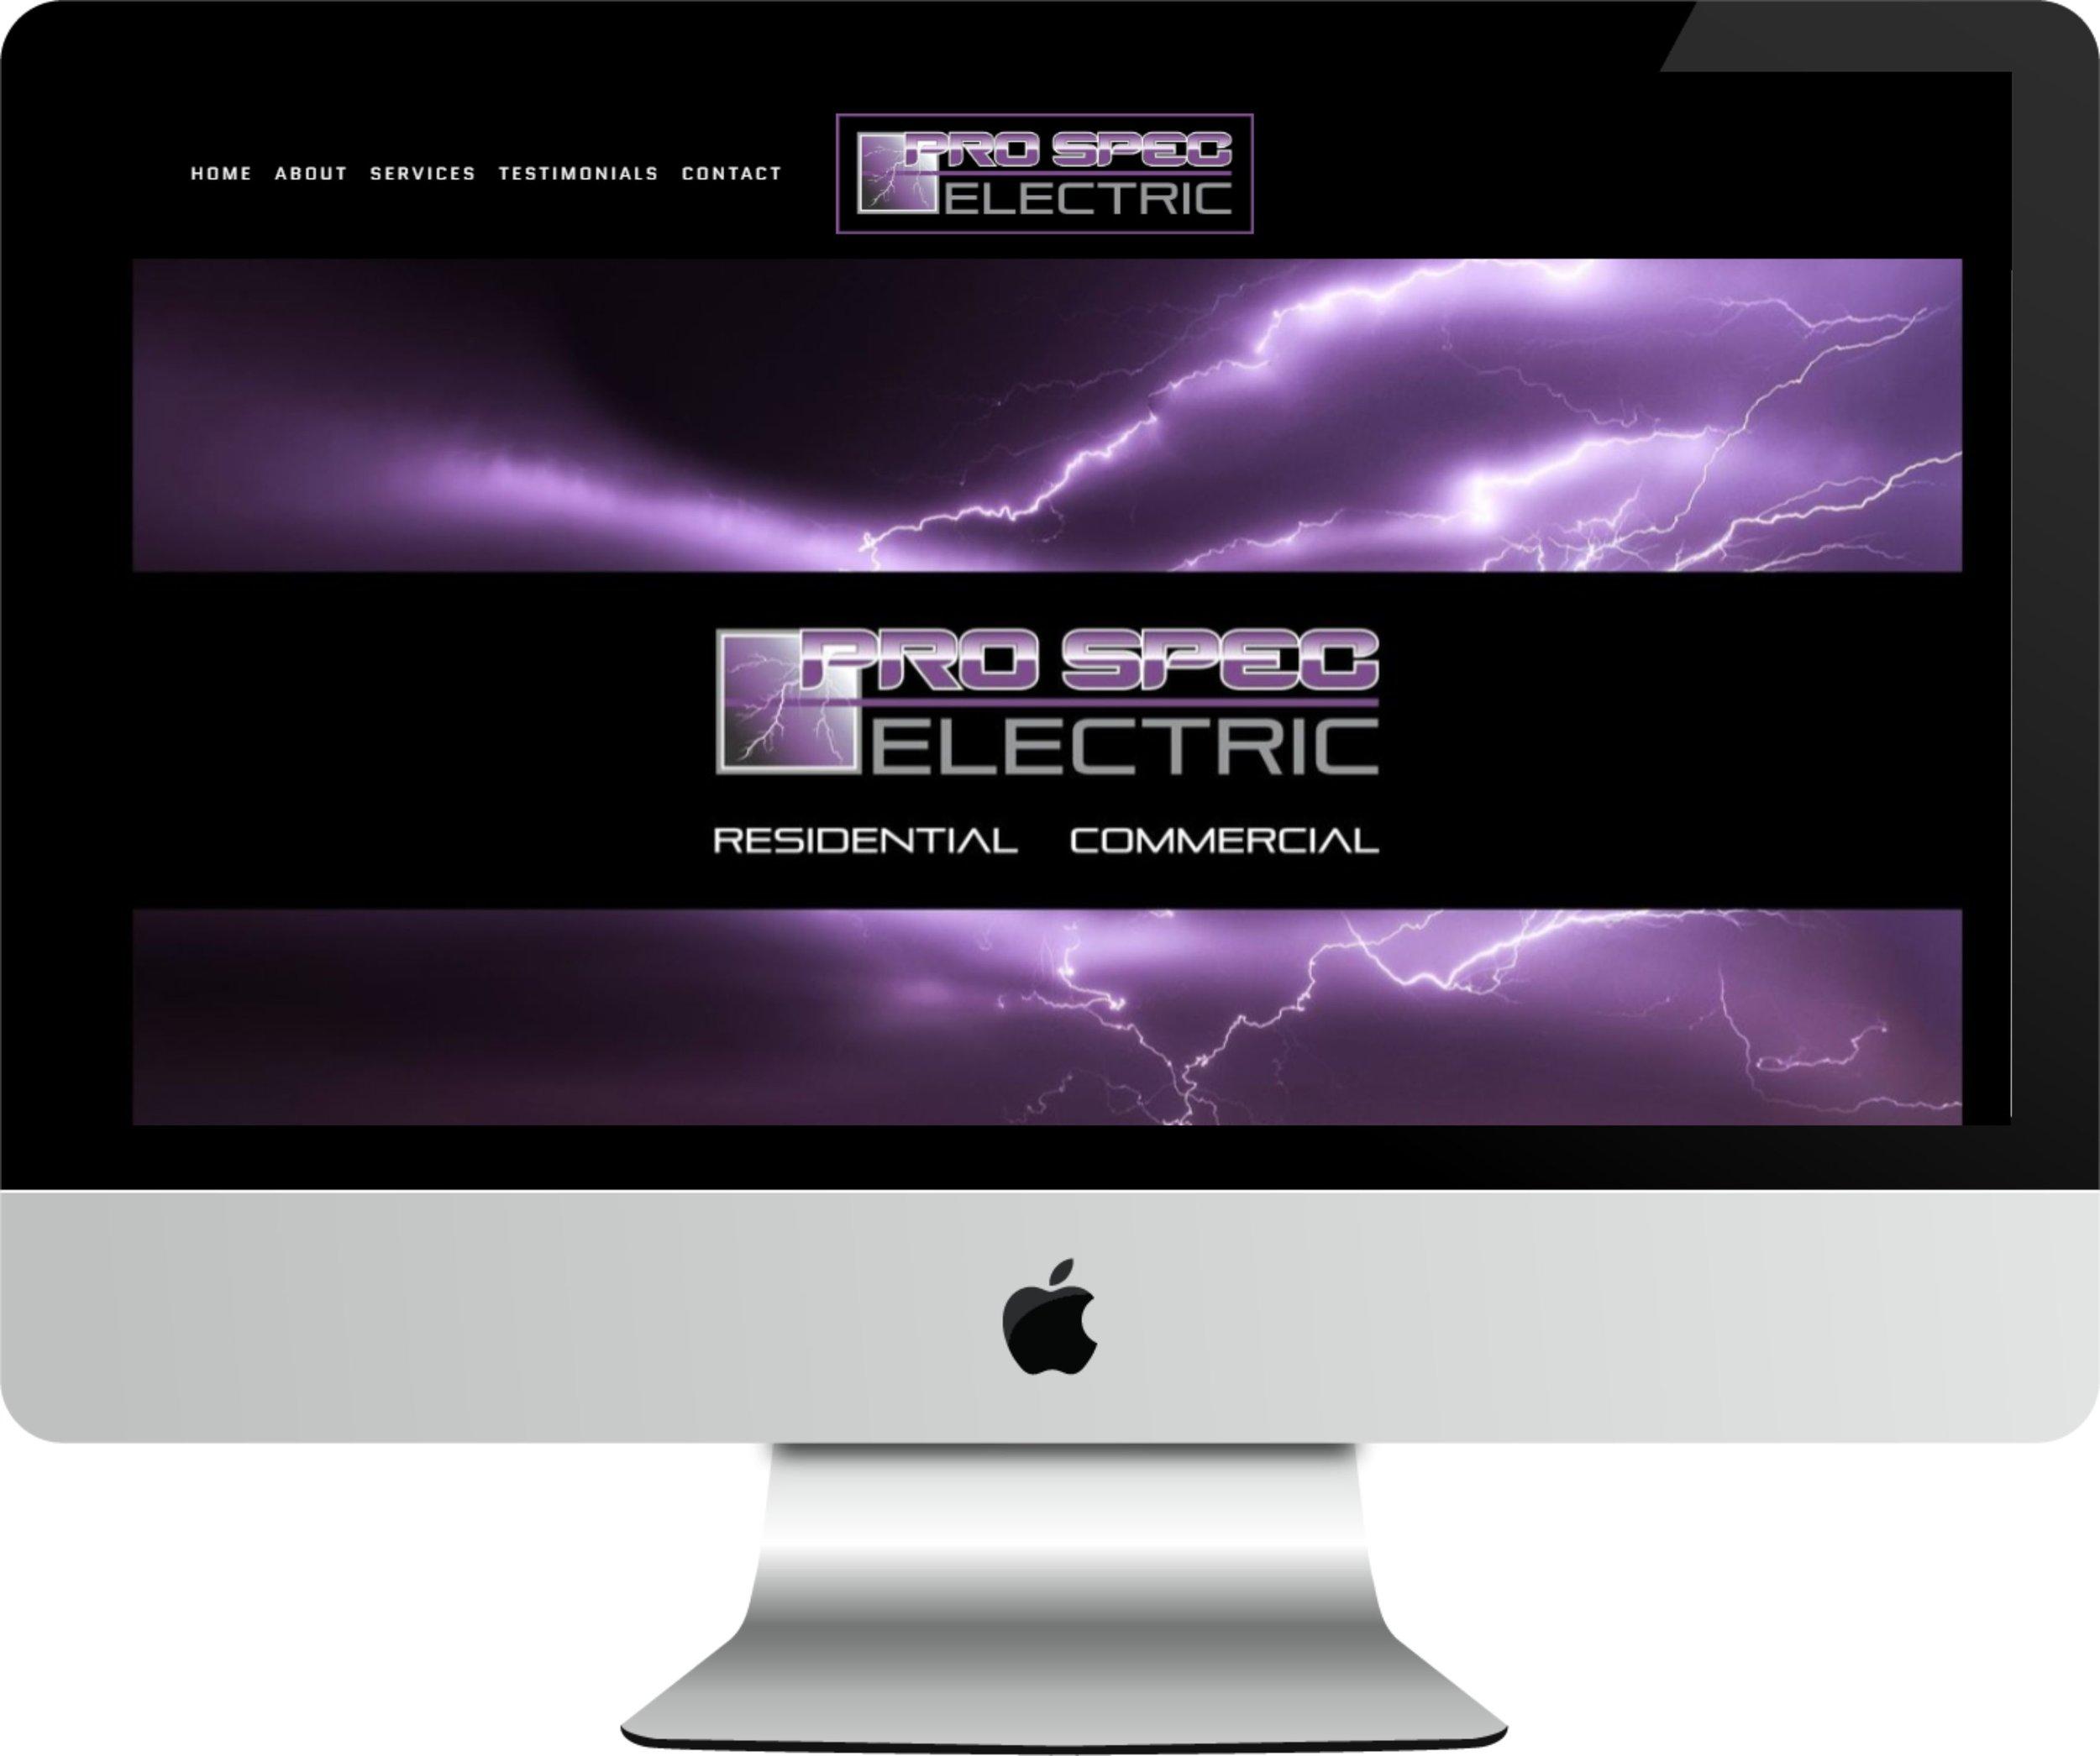 Pro Spec Electric Website.jpg